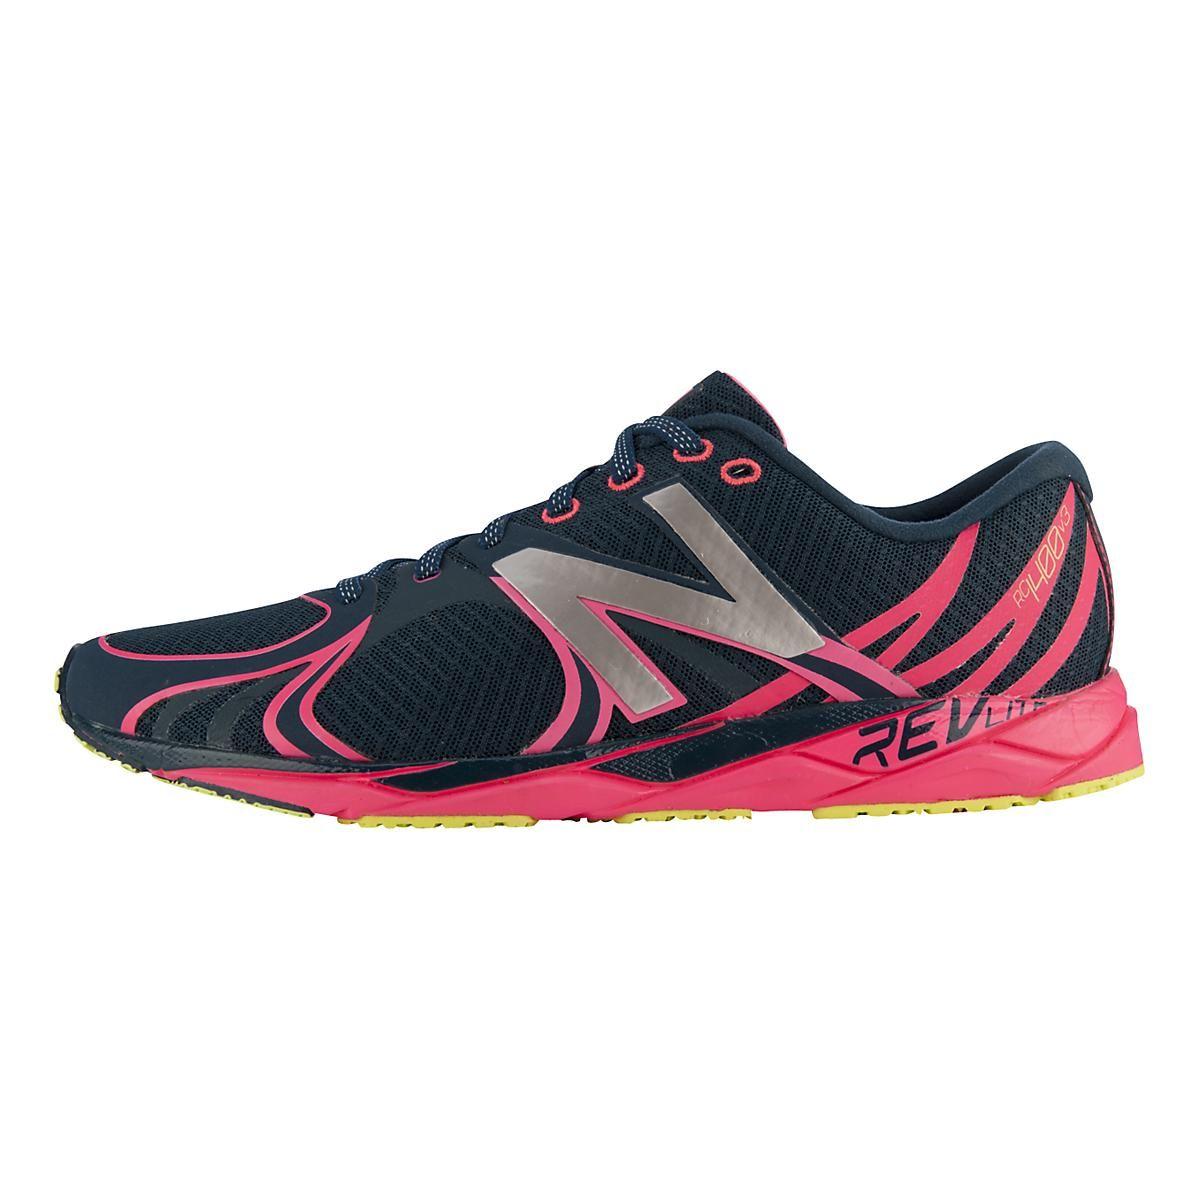 a26c2bea1a0ba Womens New Balance 1400v3 Running Shoe Fitness Gadgets, Running Shoes, Flats,  Exercise,